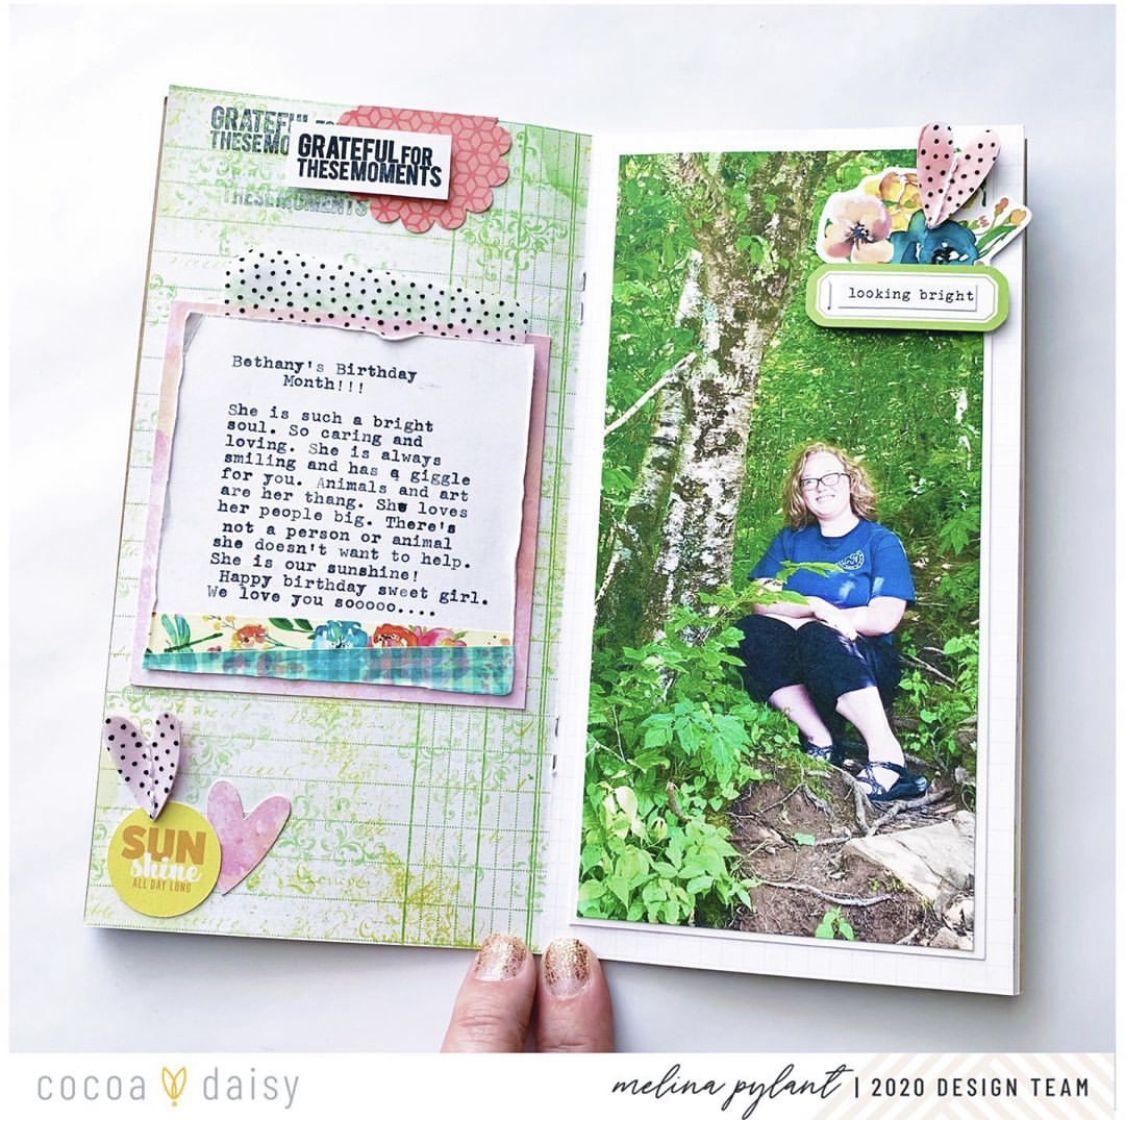 #cocoadaisy #planner #travelersnotebook #memoryplanner